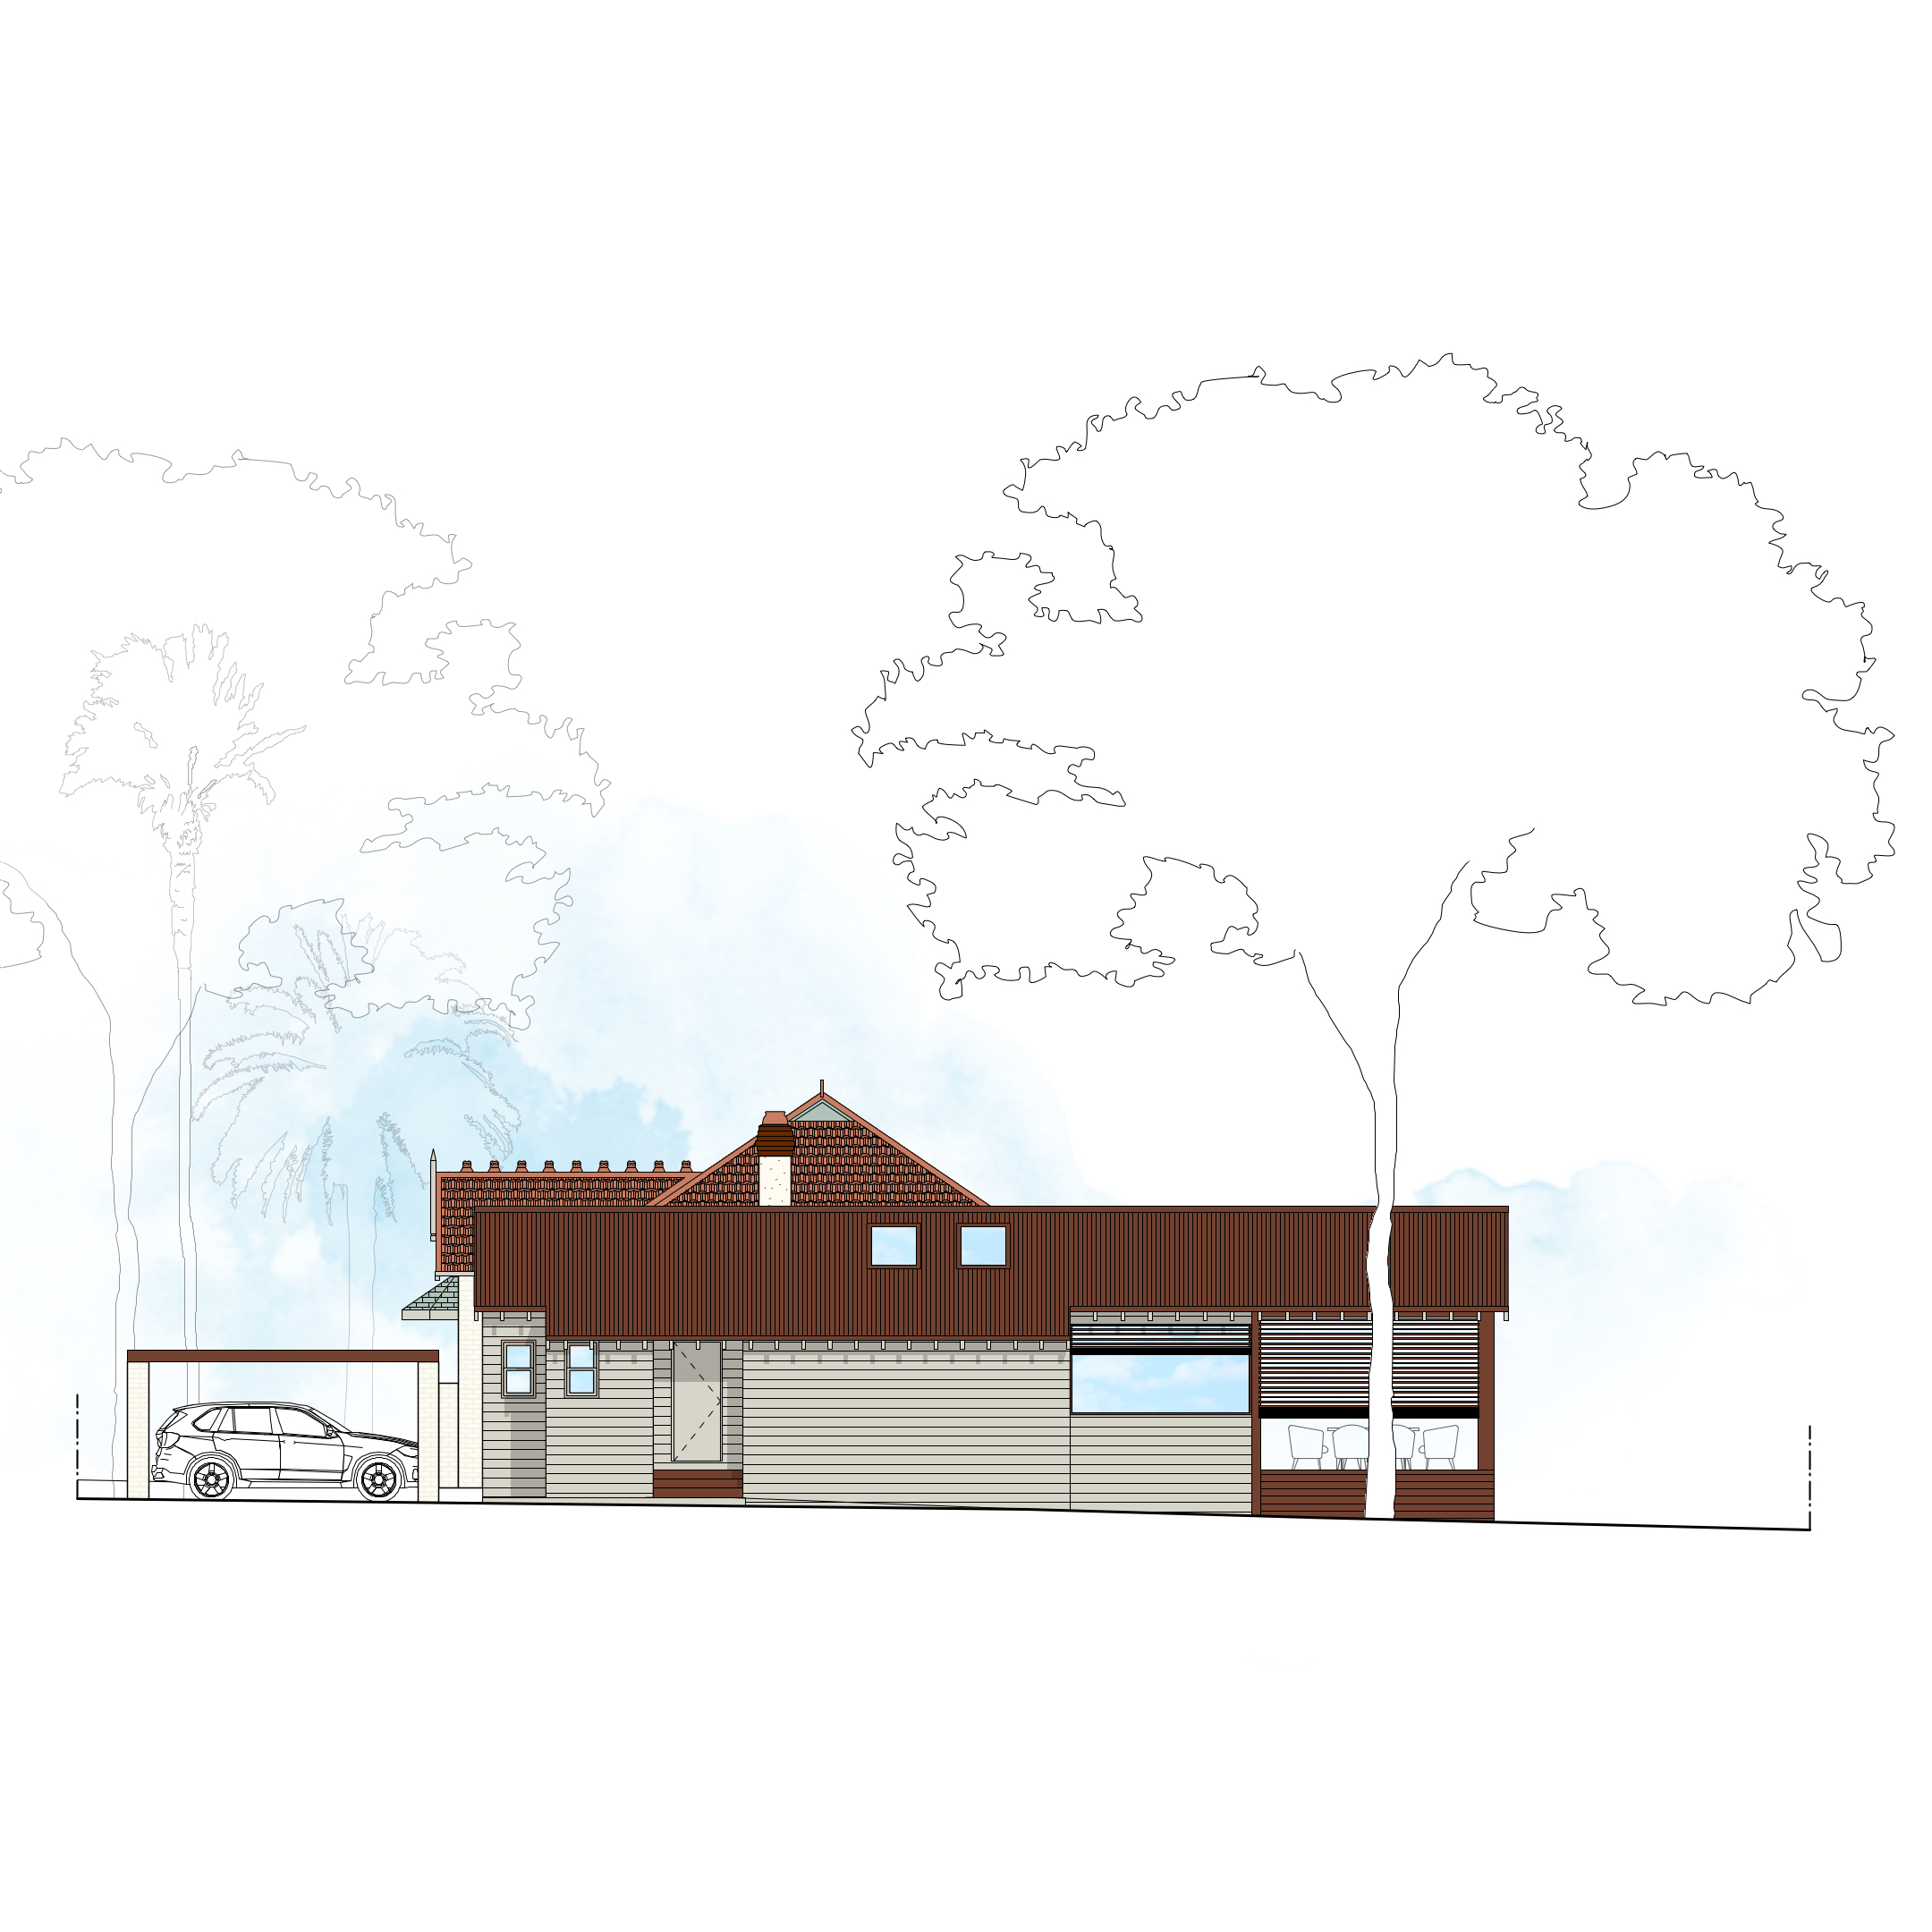 James Allen Architect Beecroft Beecroft House 2.jpg